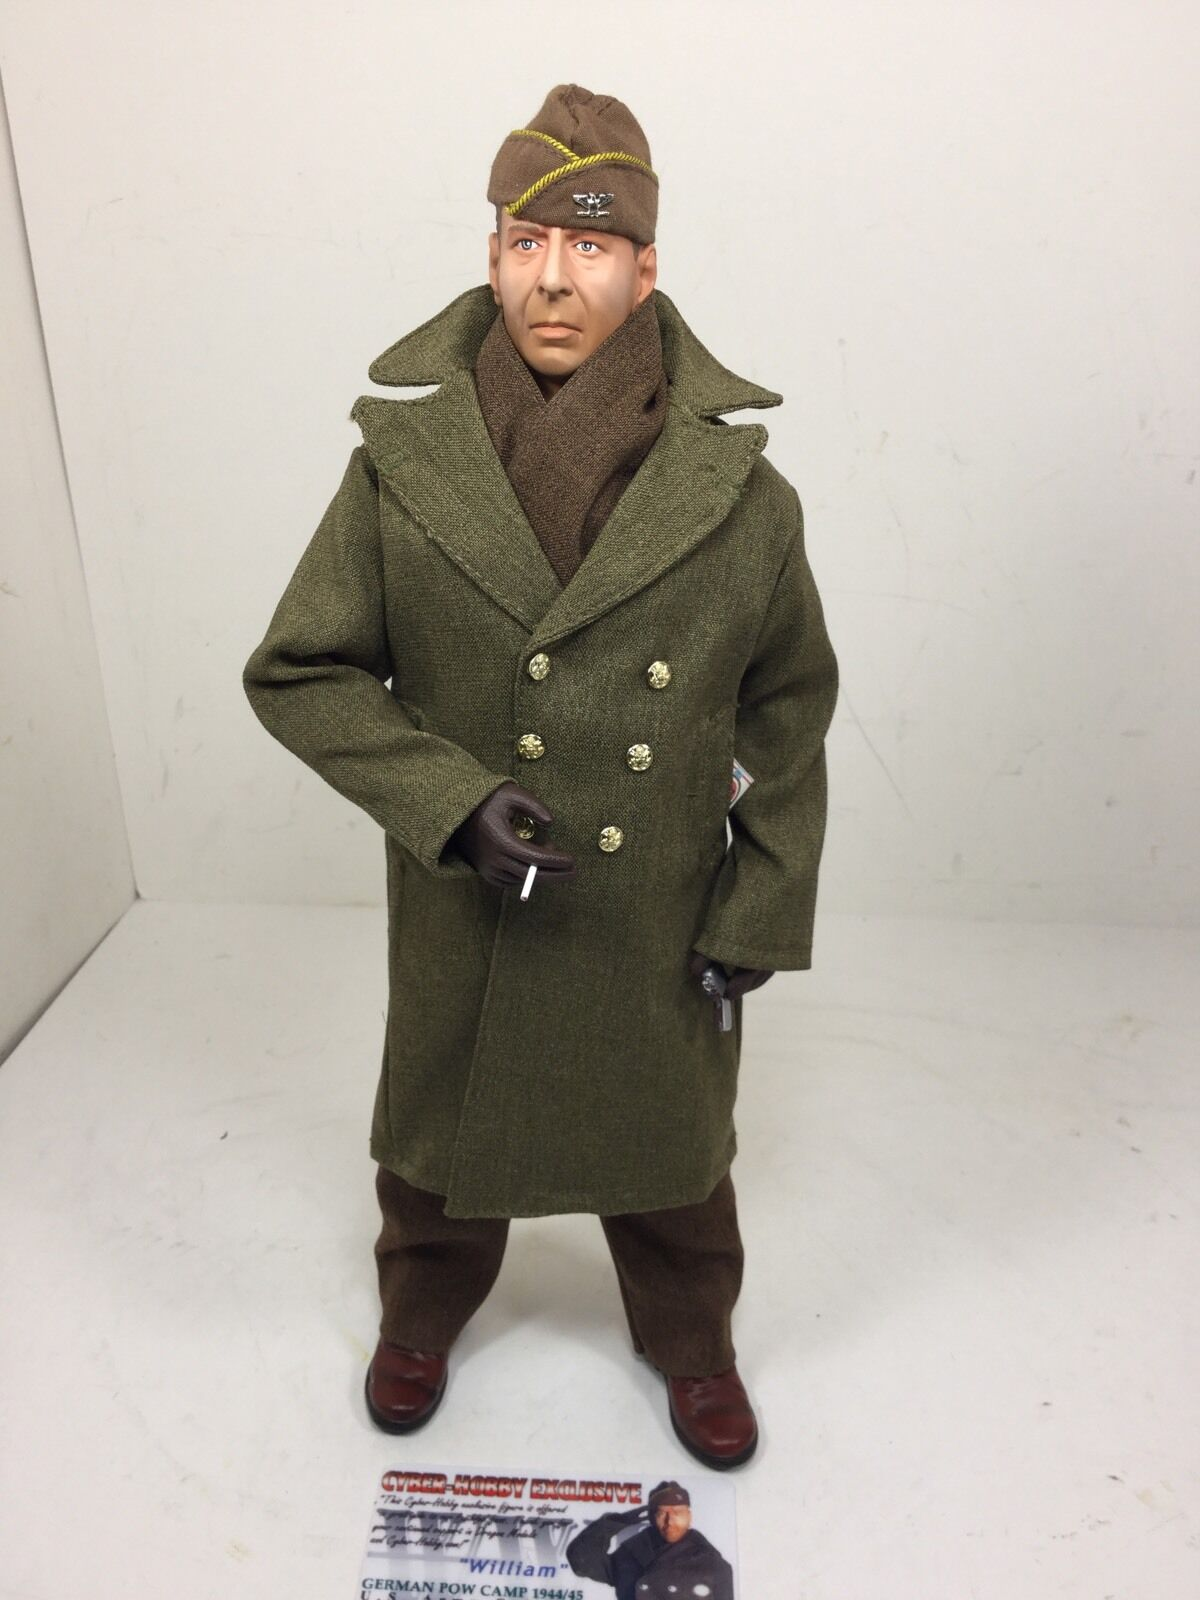 1 6 DRAGON CYBER-HOBBY COL HART BRUCE WILLIS  HART'S WAR  POW WW2 BBI DID 21st